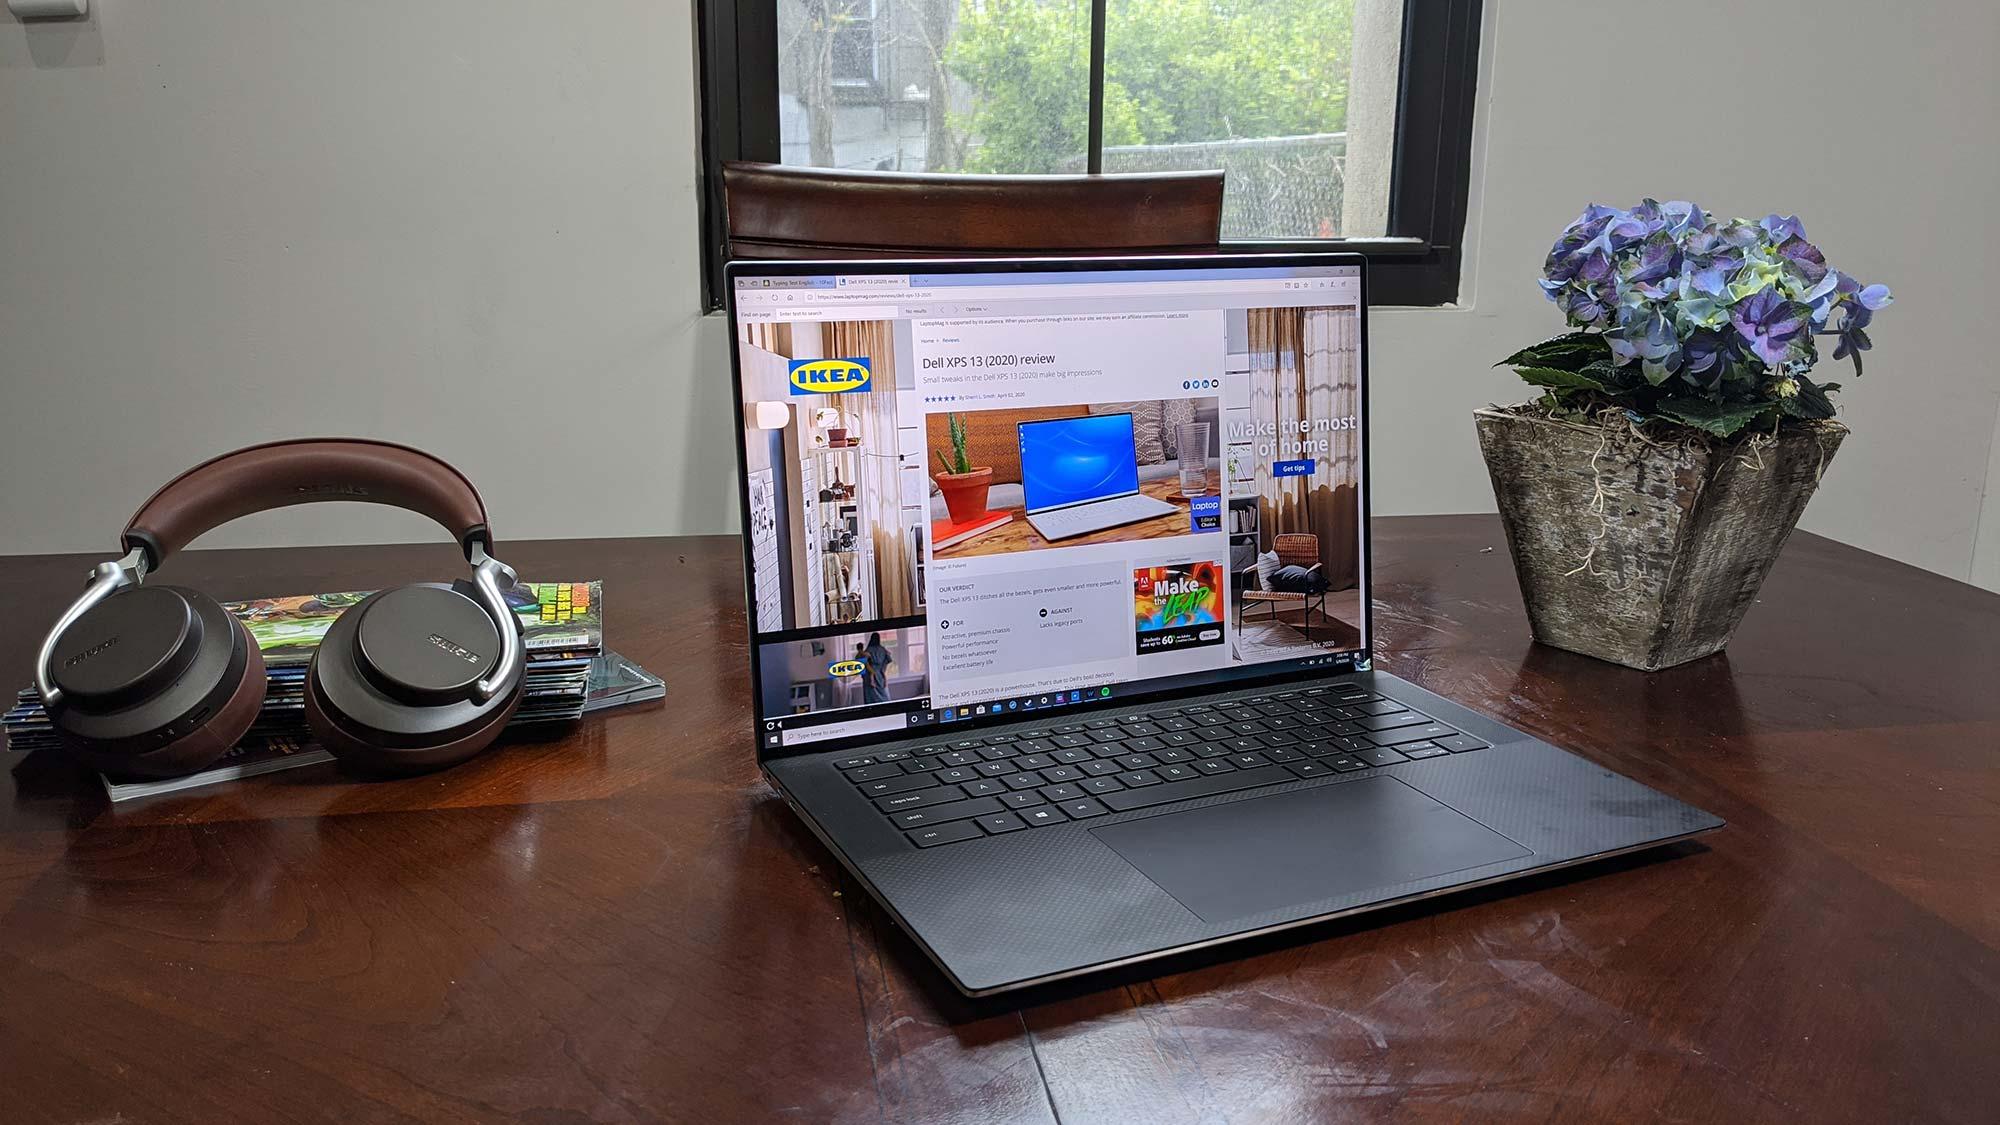 https://www.laptopmag.com/reviews/dell-xps-15-2020